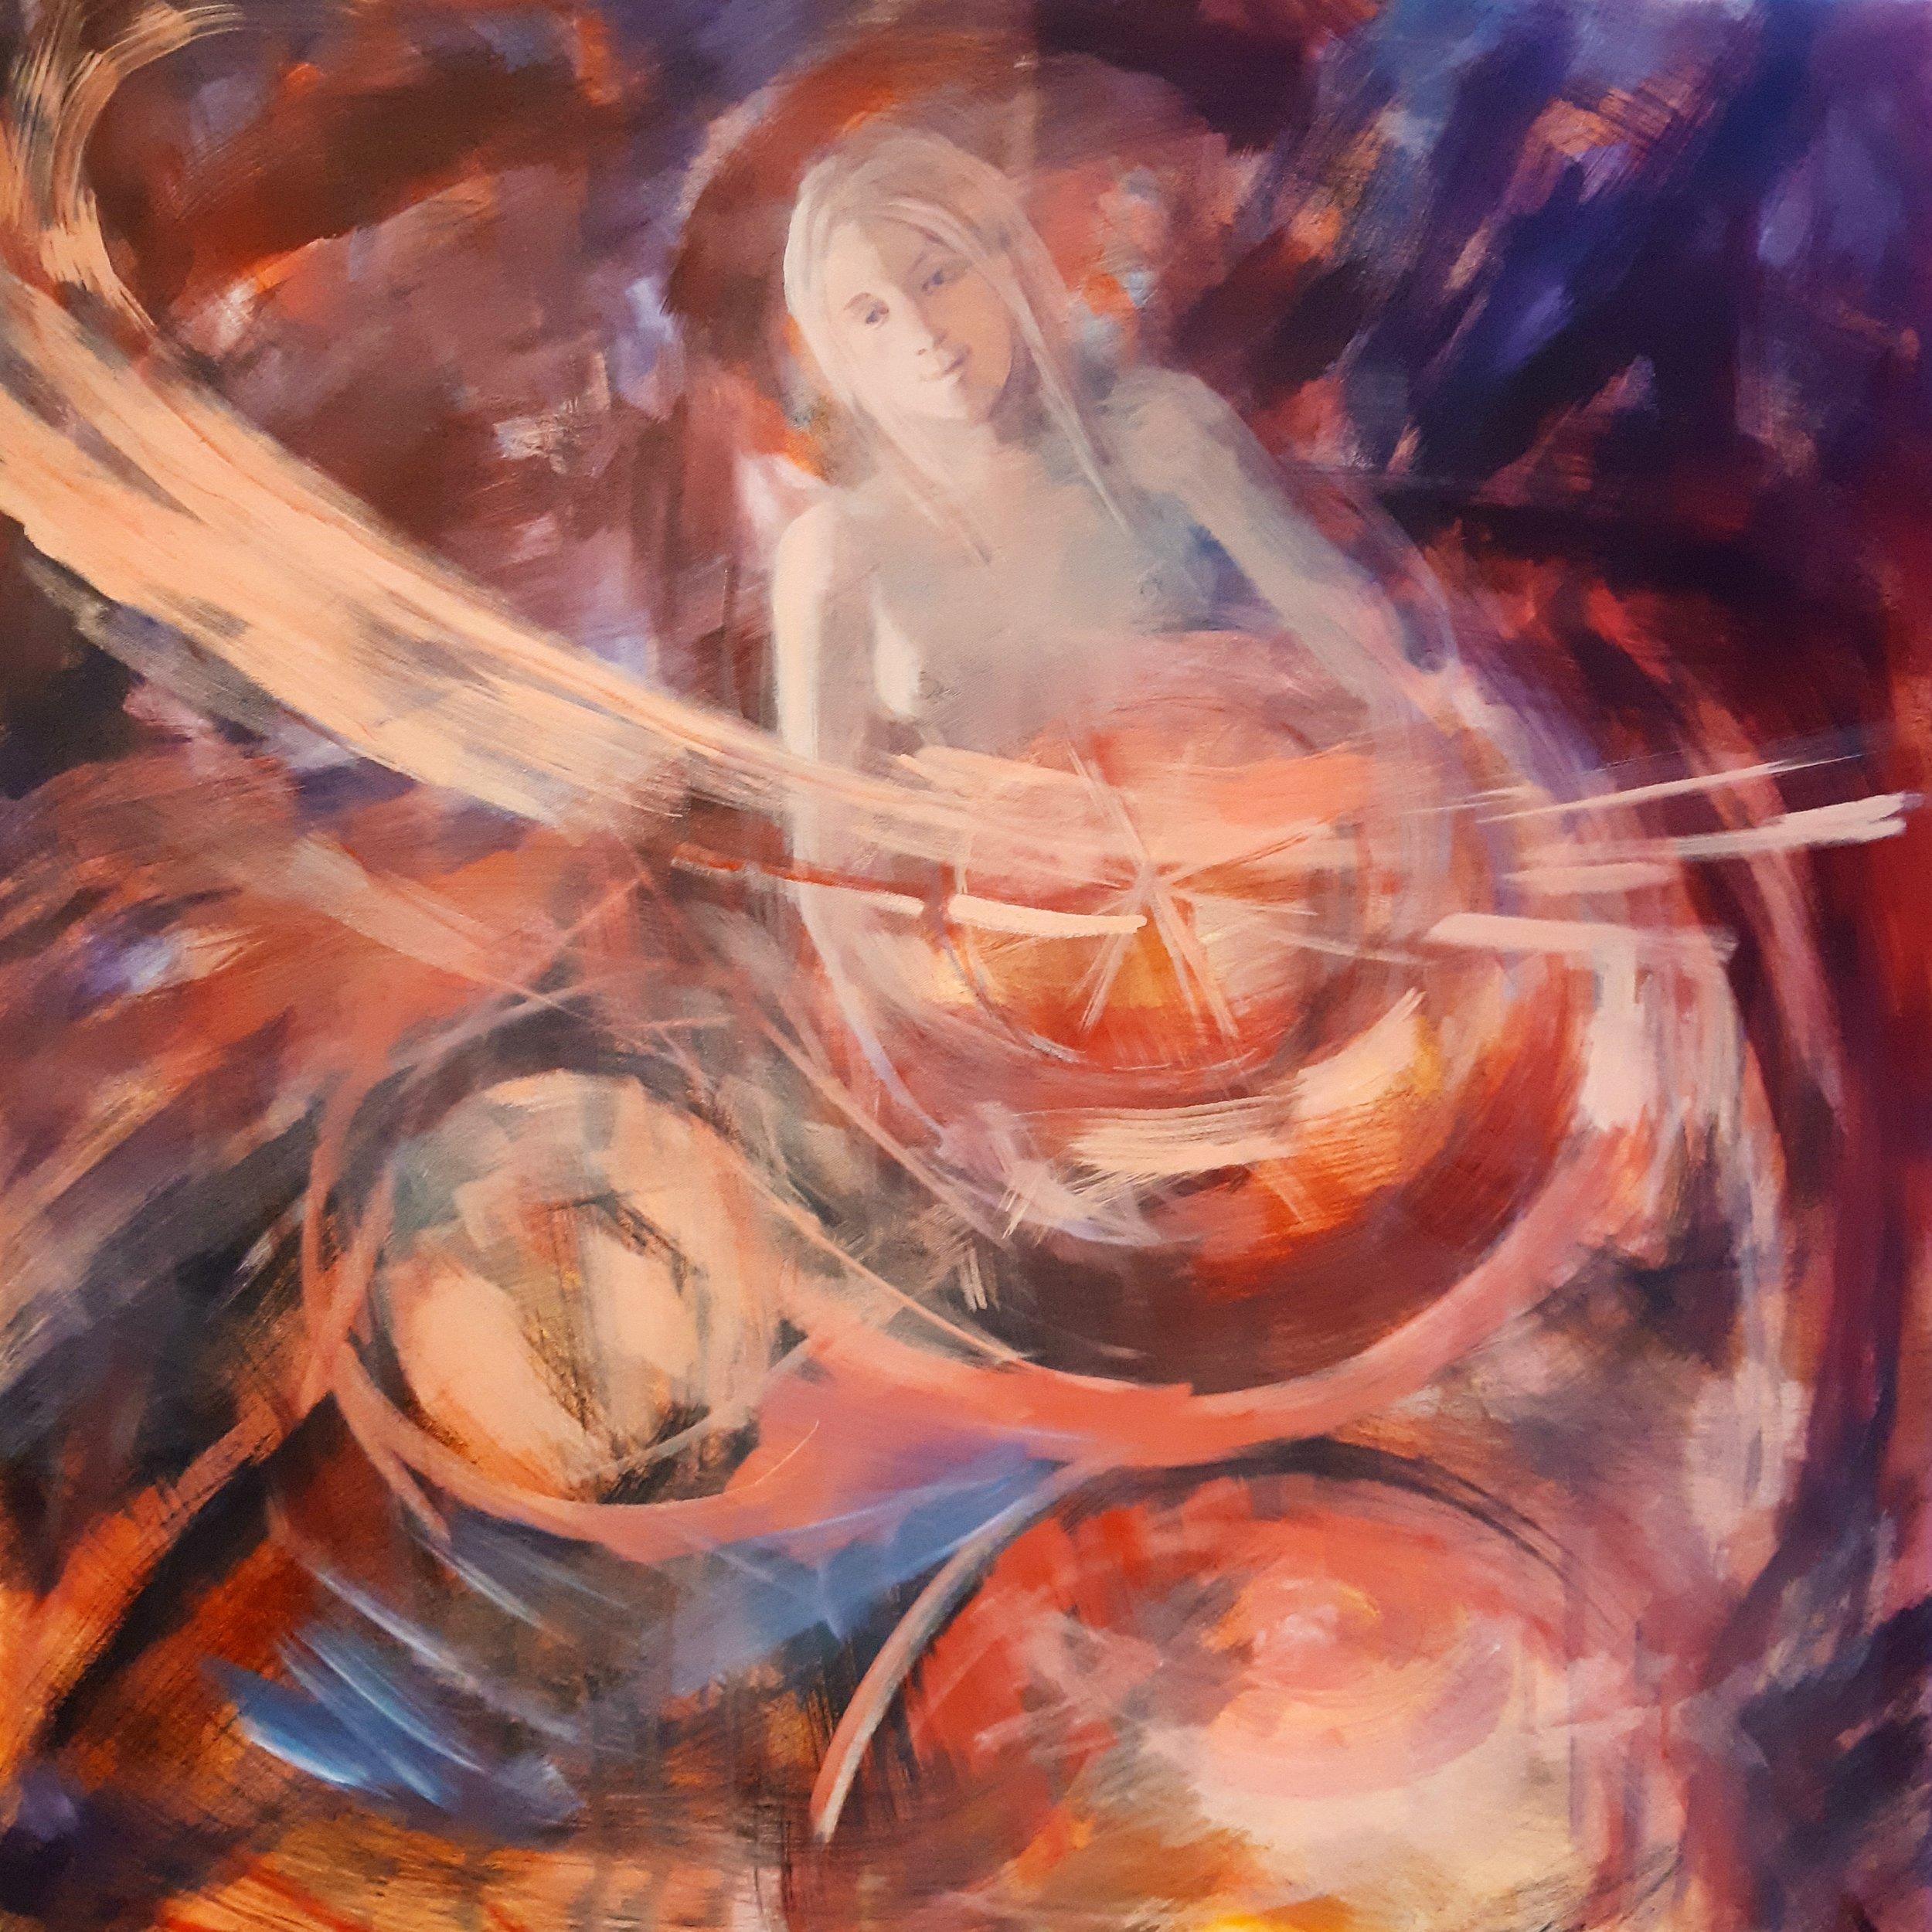 SOLD, Holding, Acrylic on Canvas, Copyright 2019 Hirschten